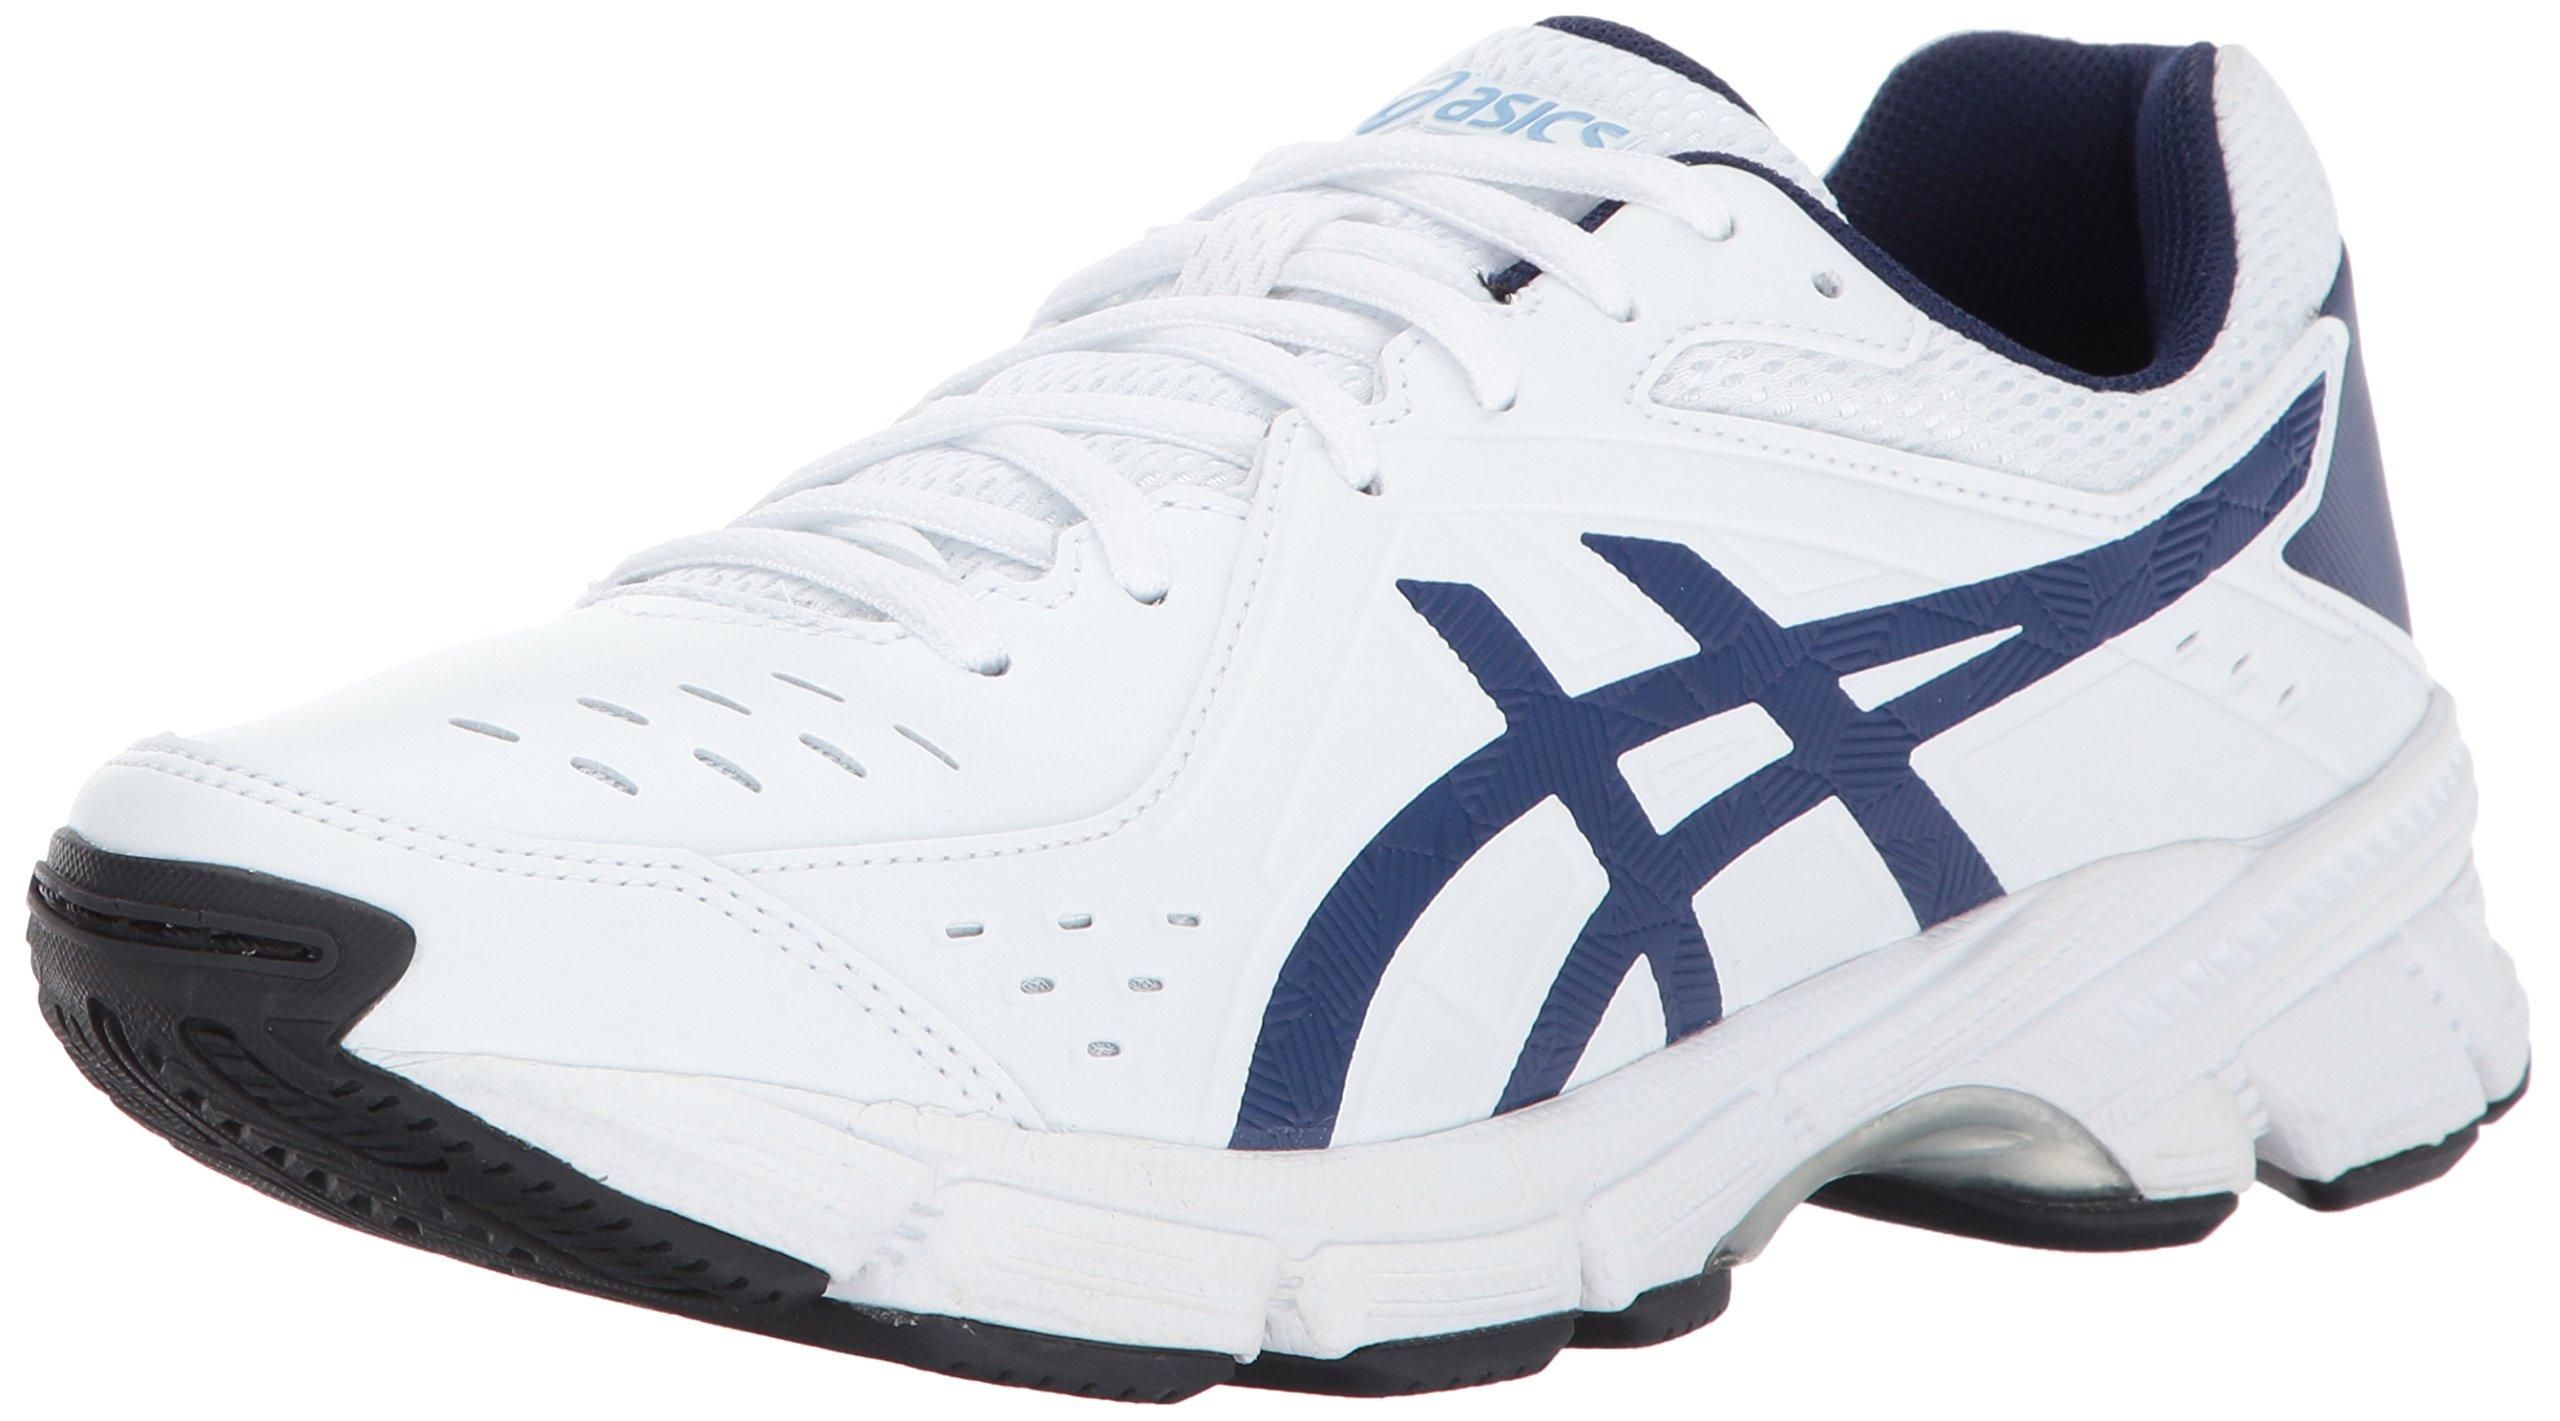 ASICS Women's Gel-195 TR Cross-Trainer-Shoes, White/Indigo Blue/Airy Blue, 9.5 D US